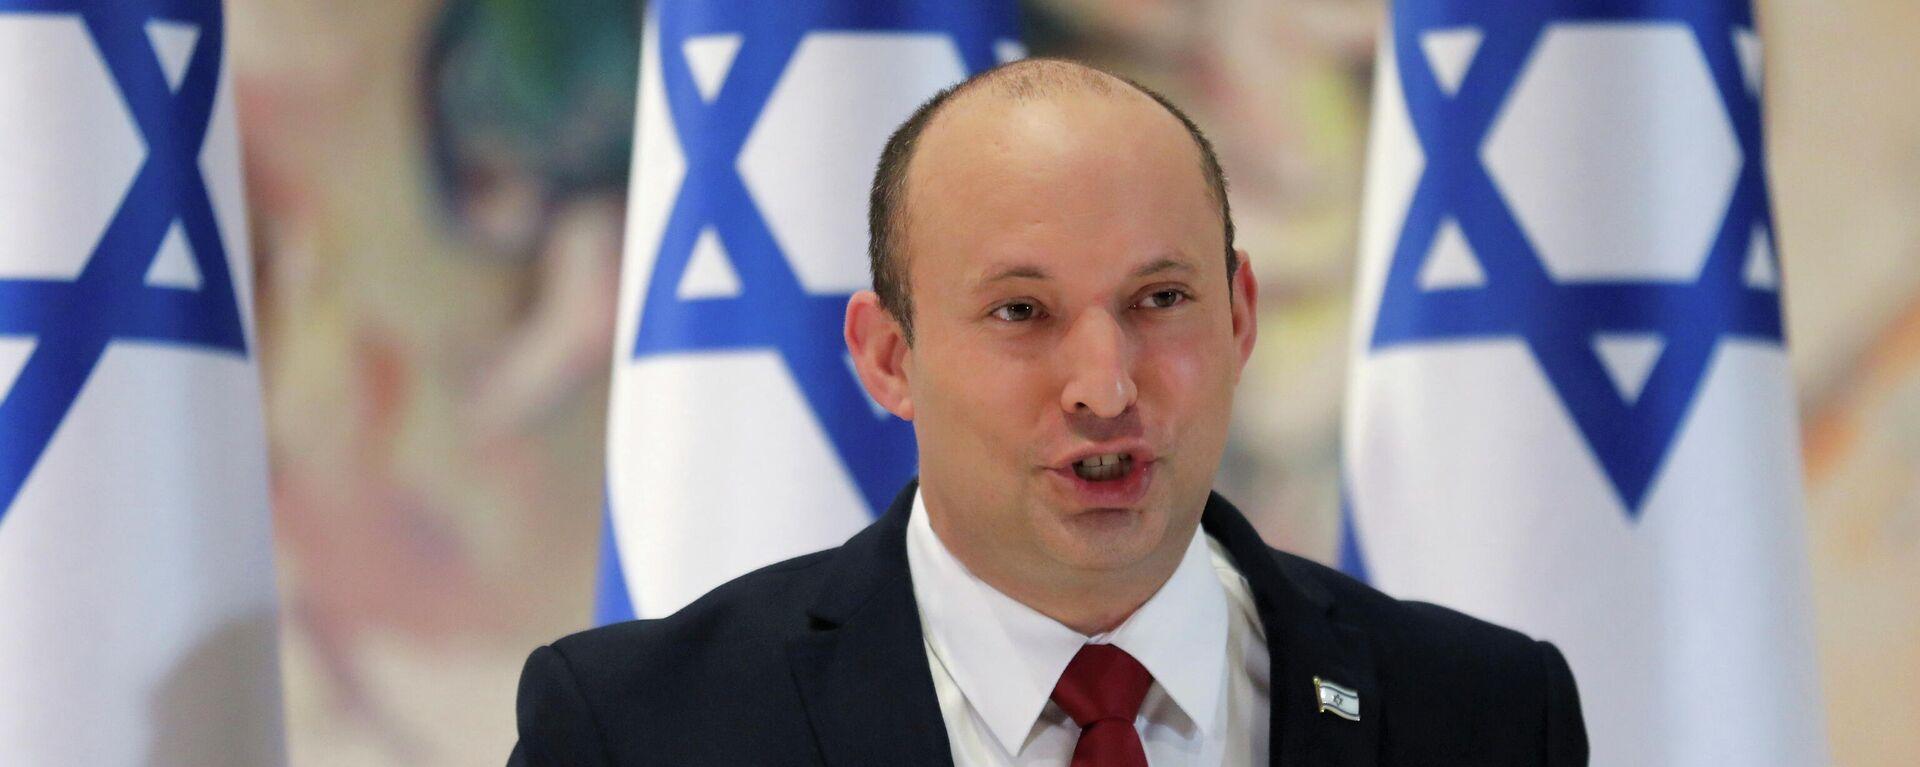 Naftali Bennett, primer ministro de Israel - Sputnik Mundo, 1920, 17.08.2021